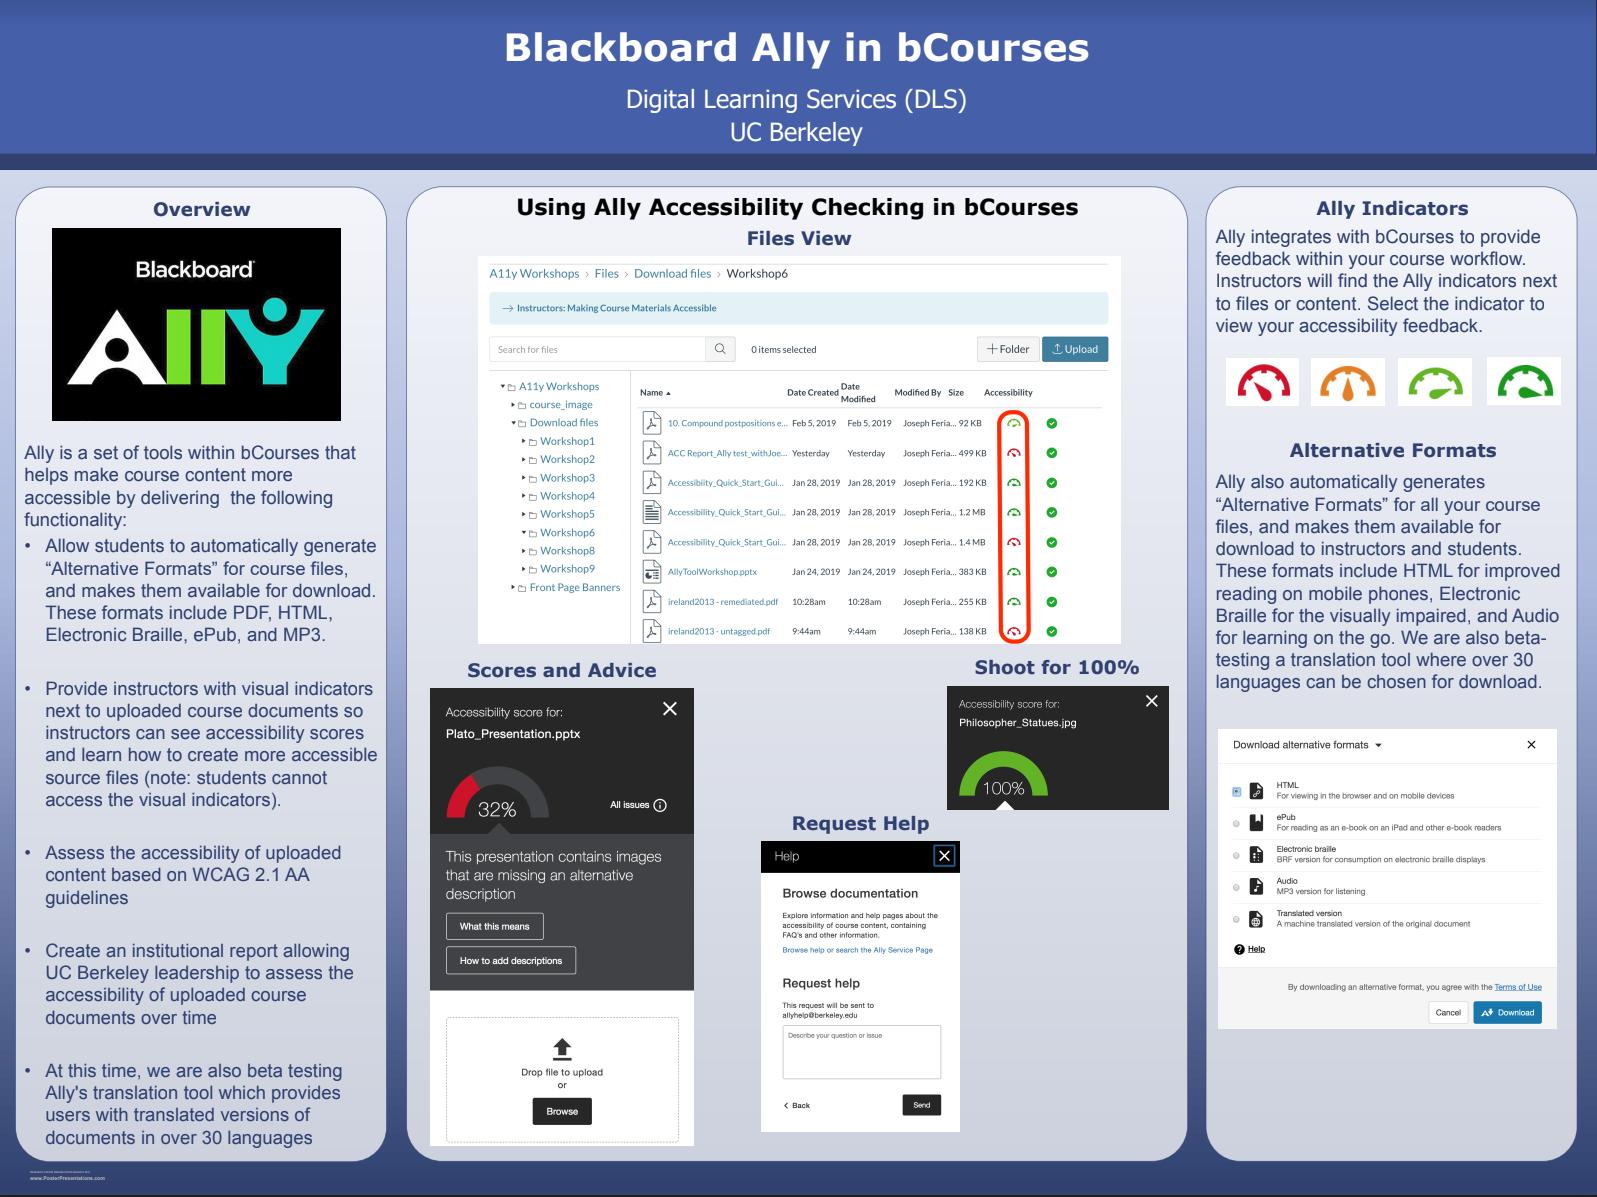 image of Blackboard Ally poster